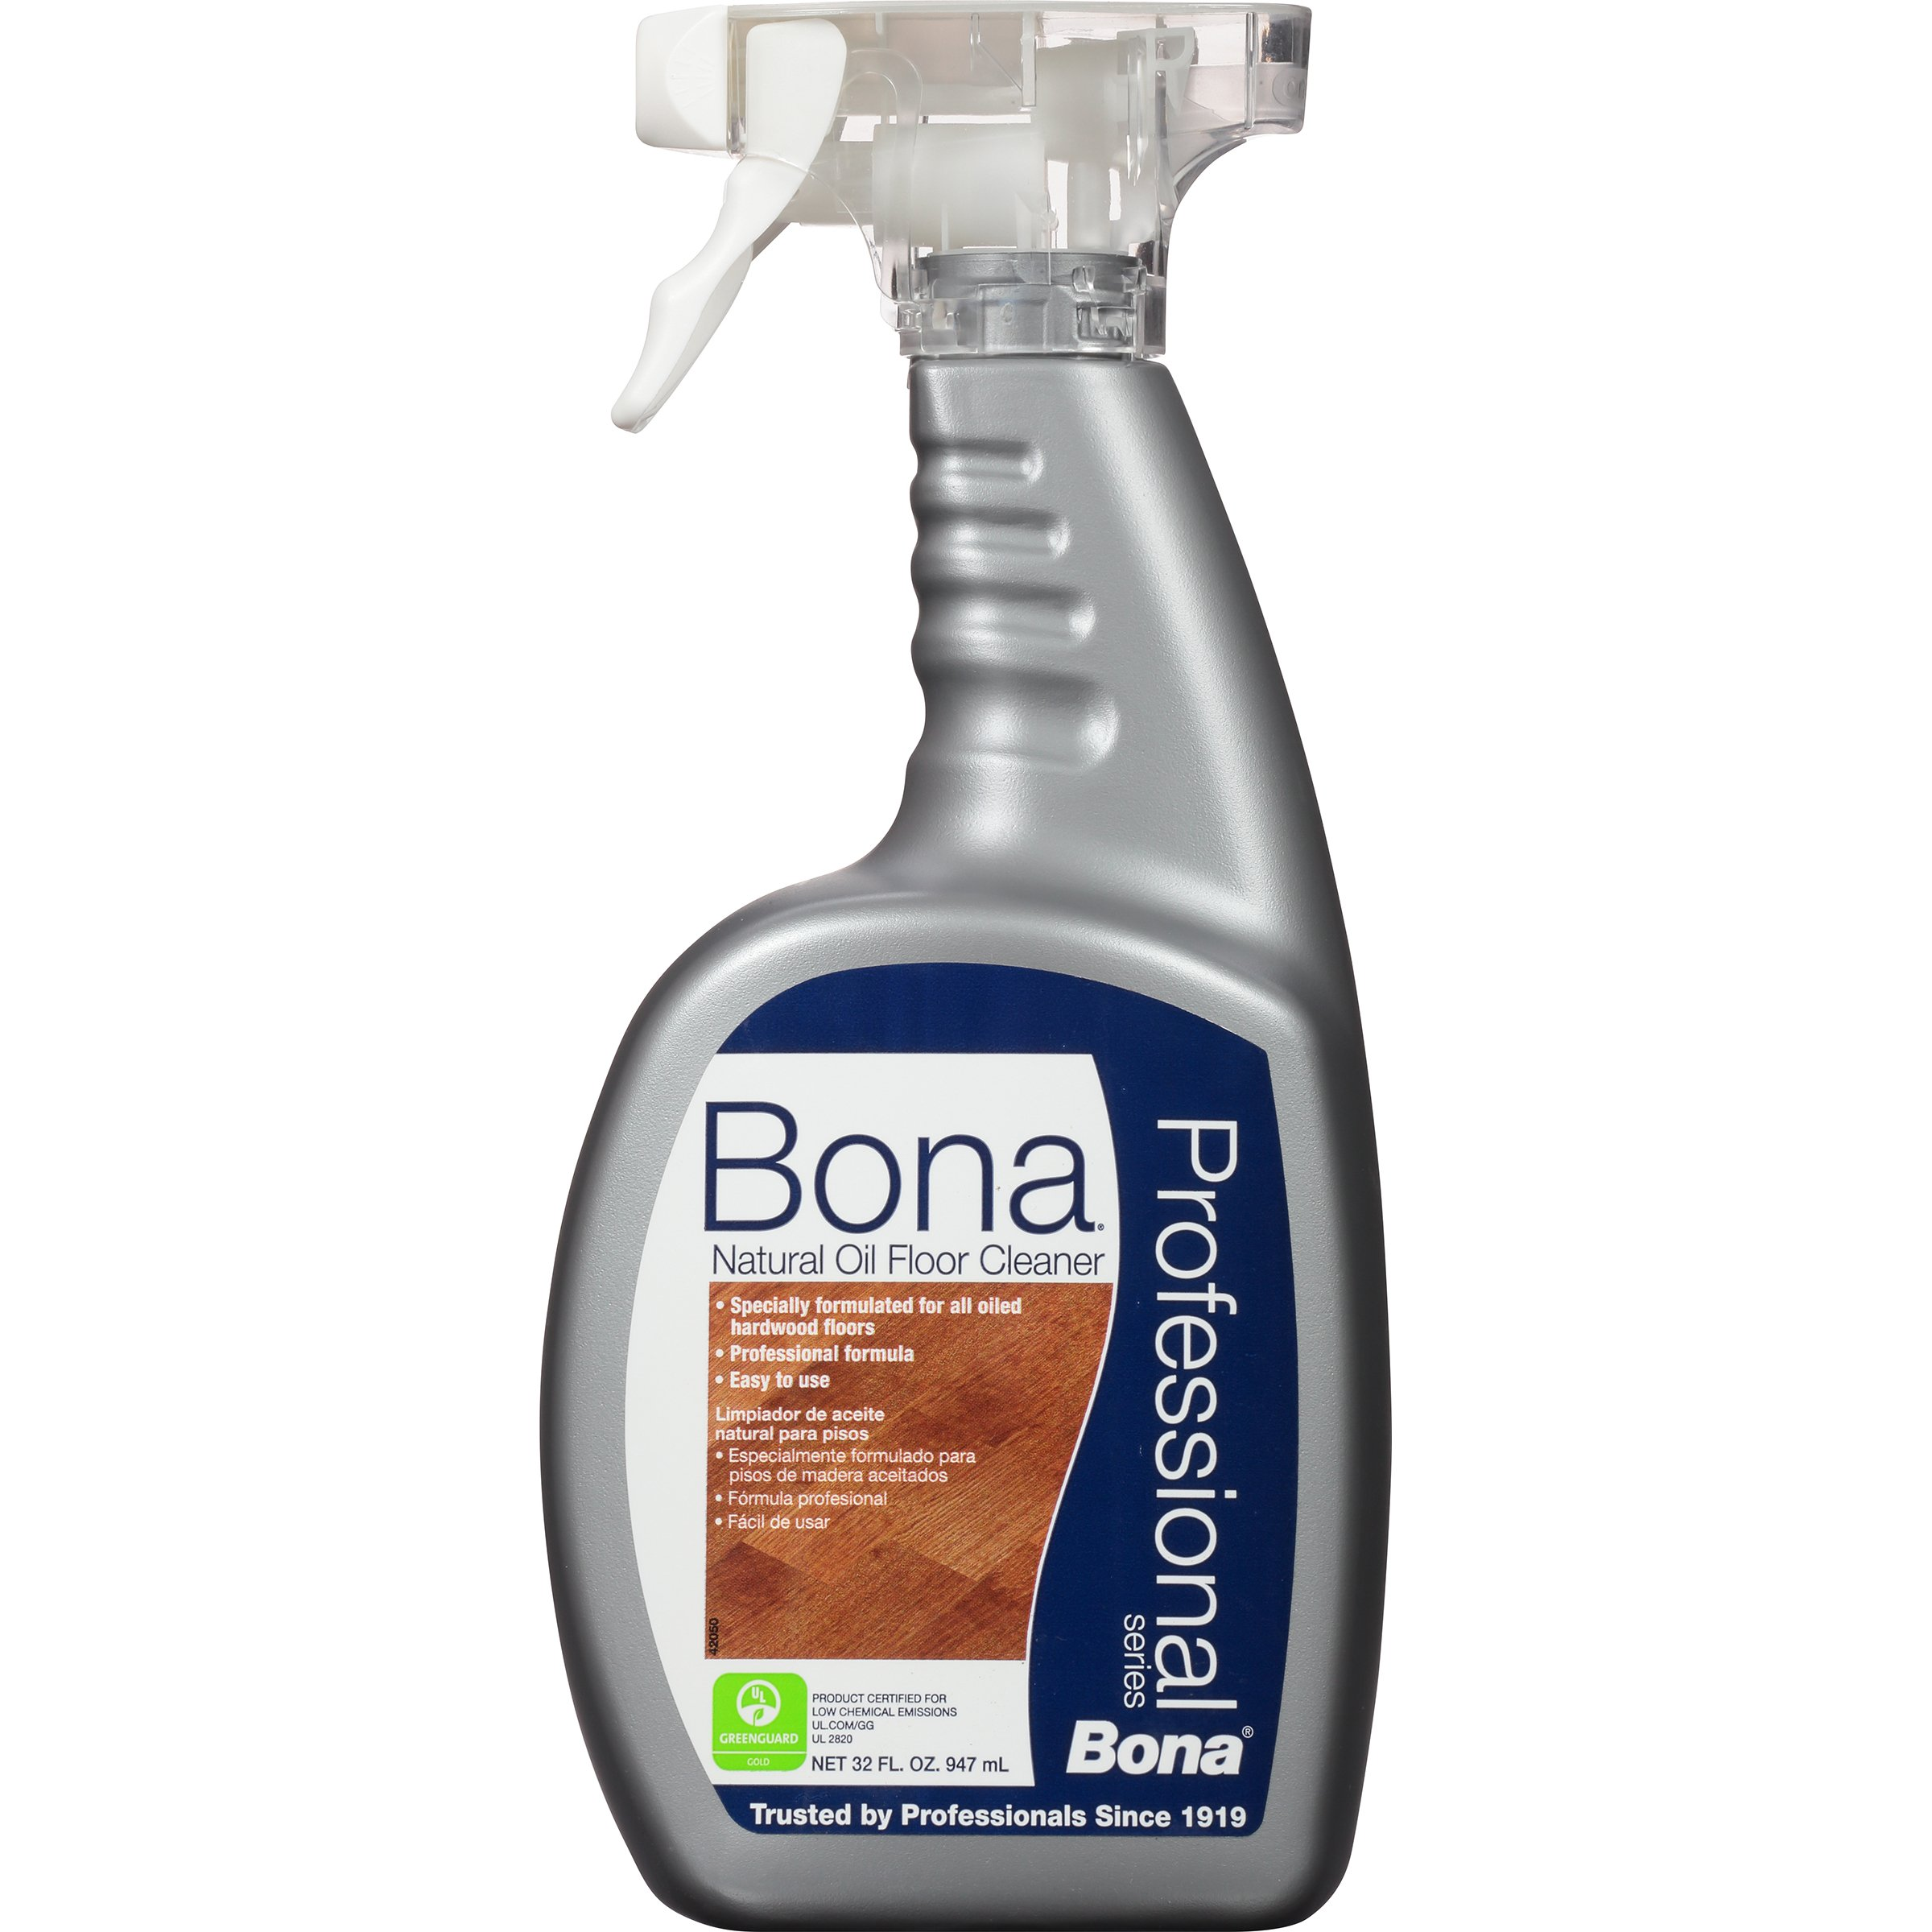 Bona BonaKemi USA WM701151001 Hardwood Floor Cleaner Natural Oil Floor Cleaner Pro 32oz